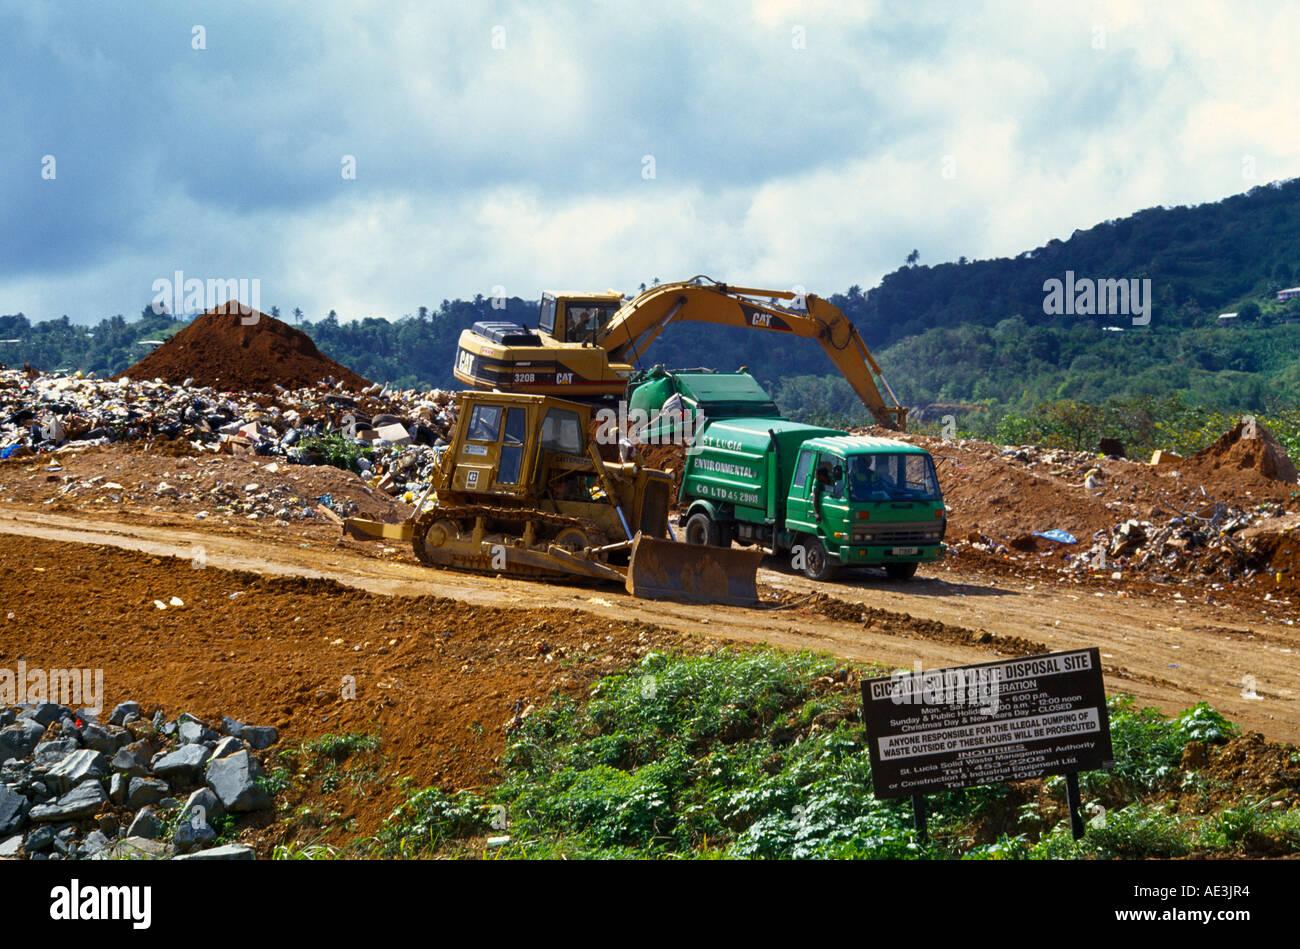 ciceron st lucia closure of rubbish tip site digger u0026 bulldozer